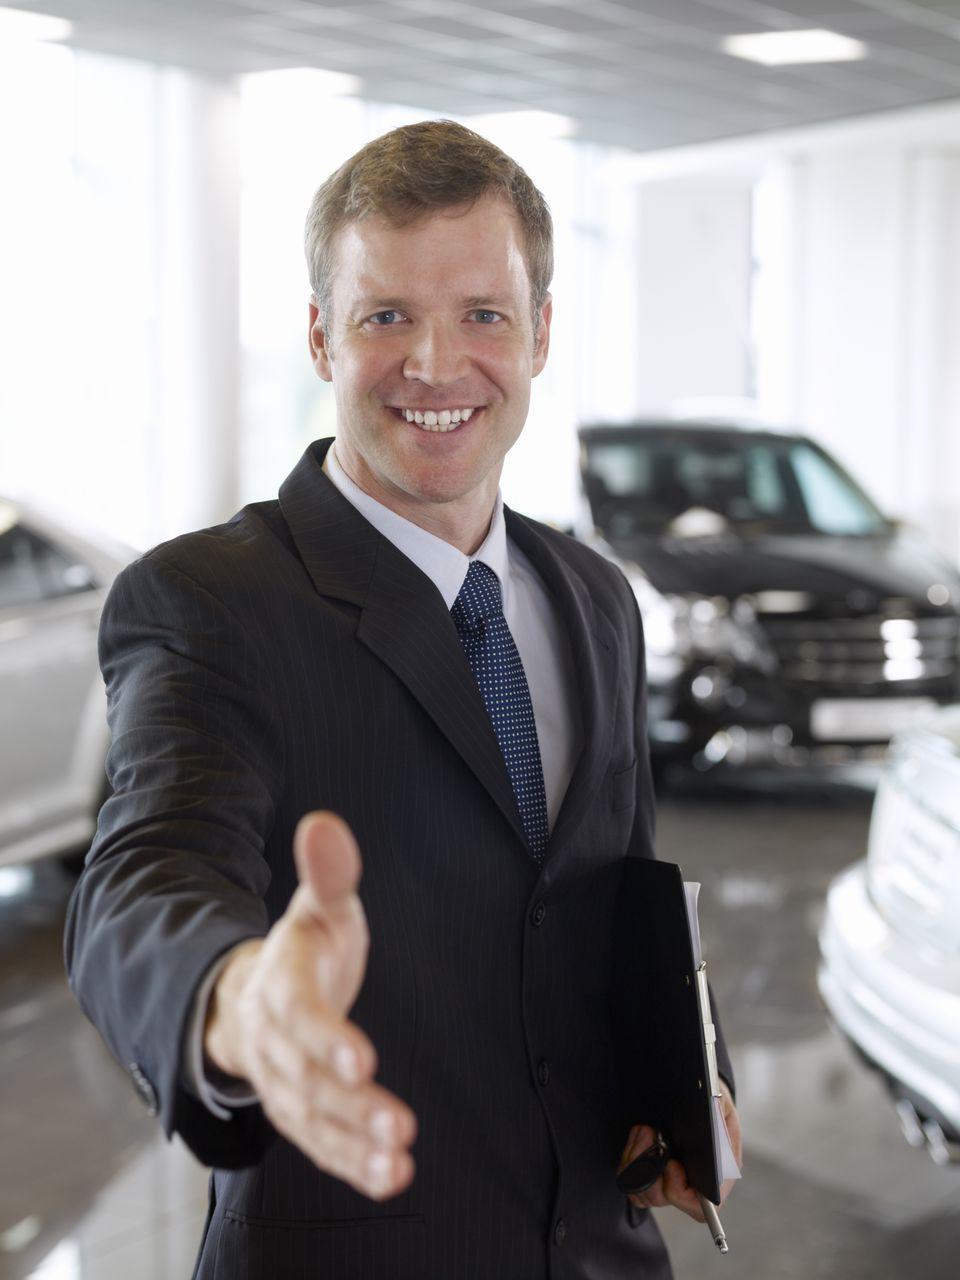 Car salesman greeting customers